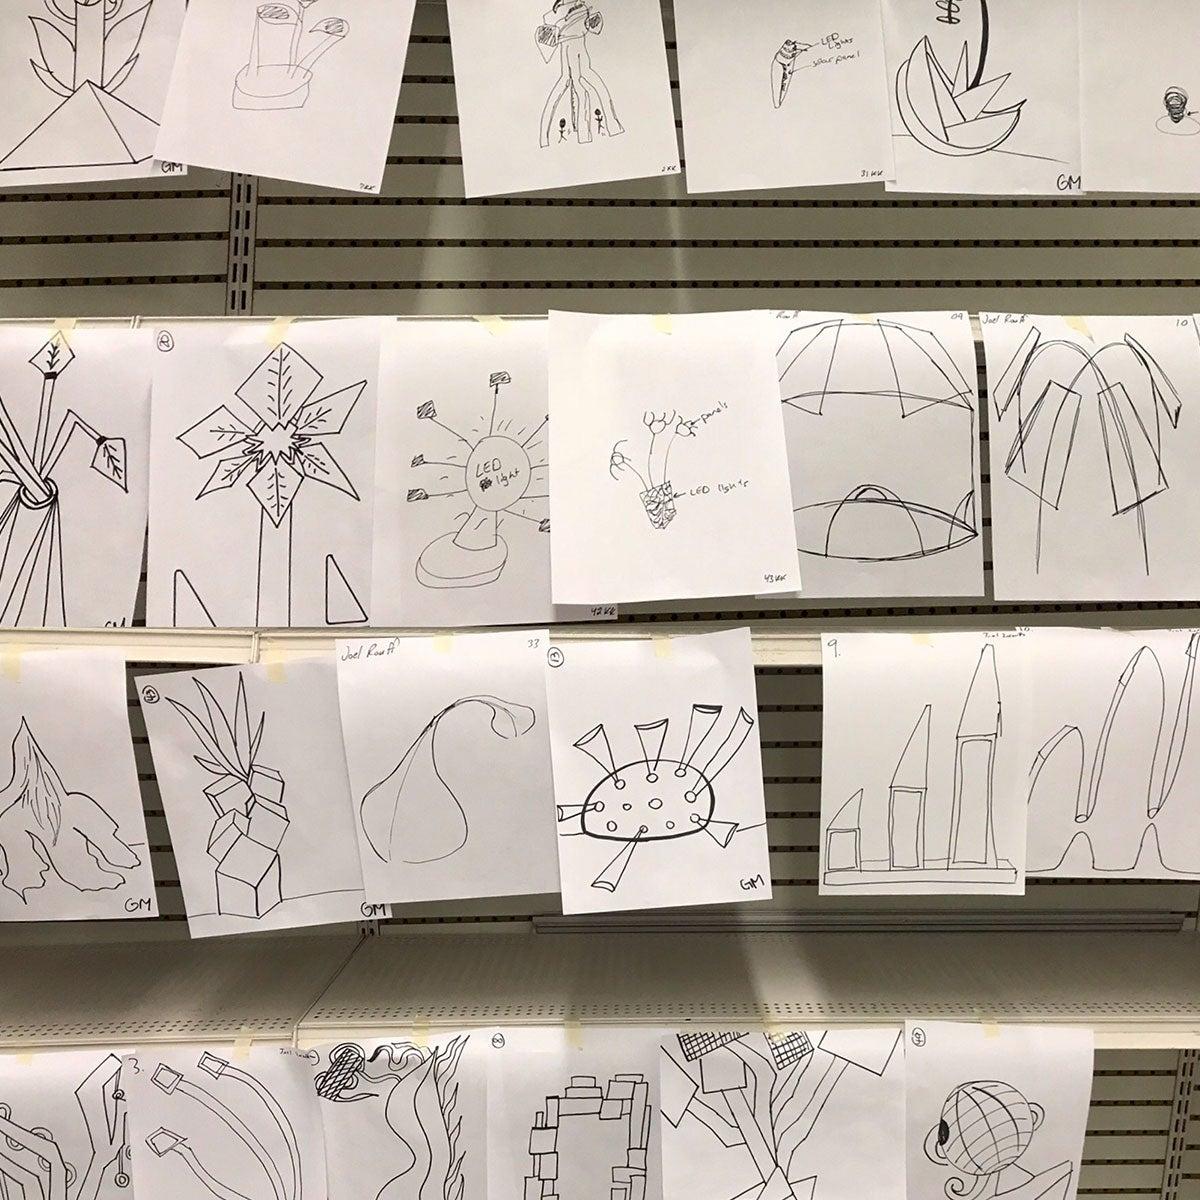 Drawings of sculpture designs.